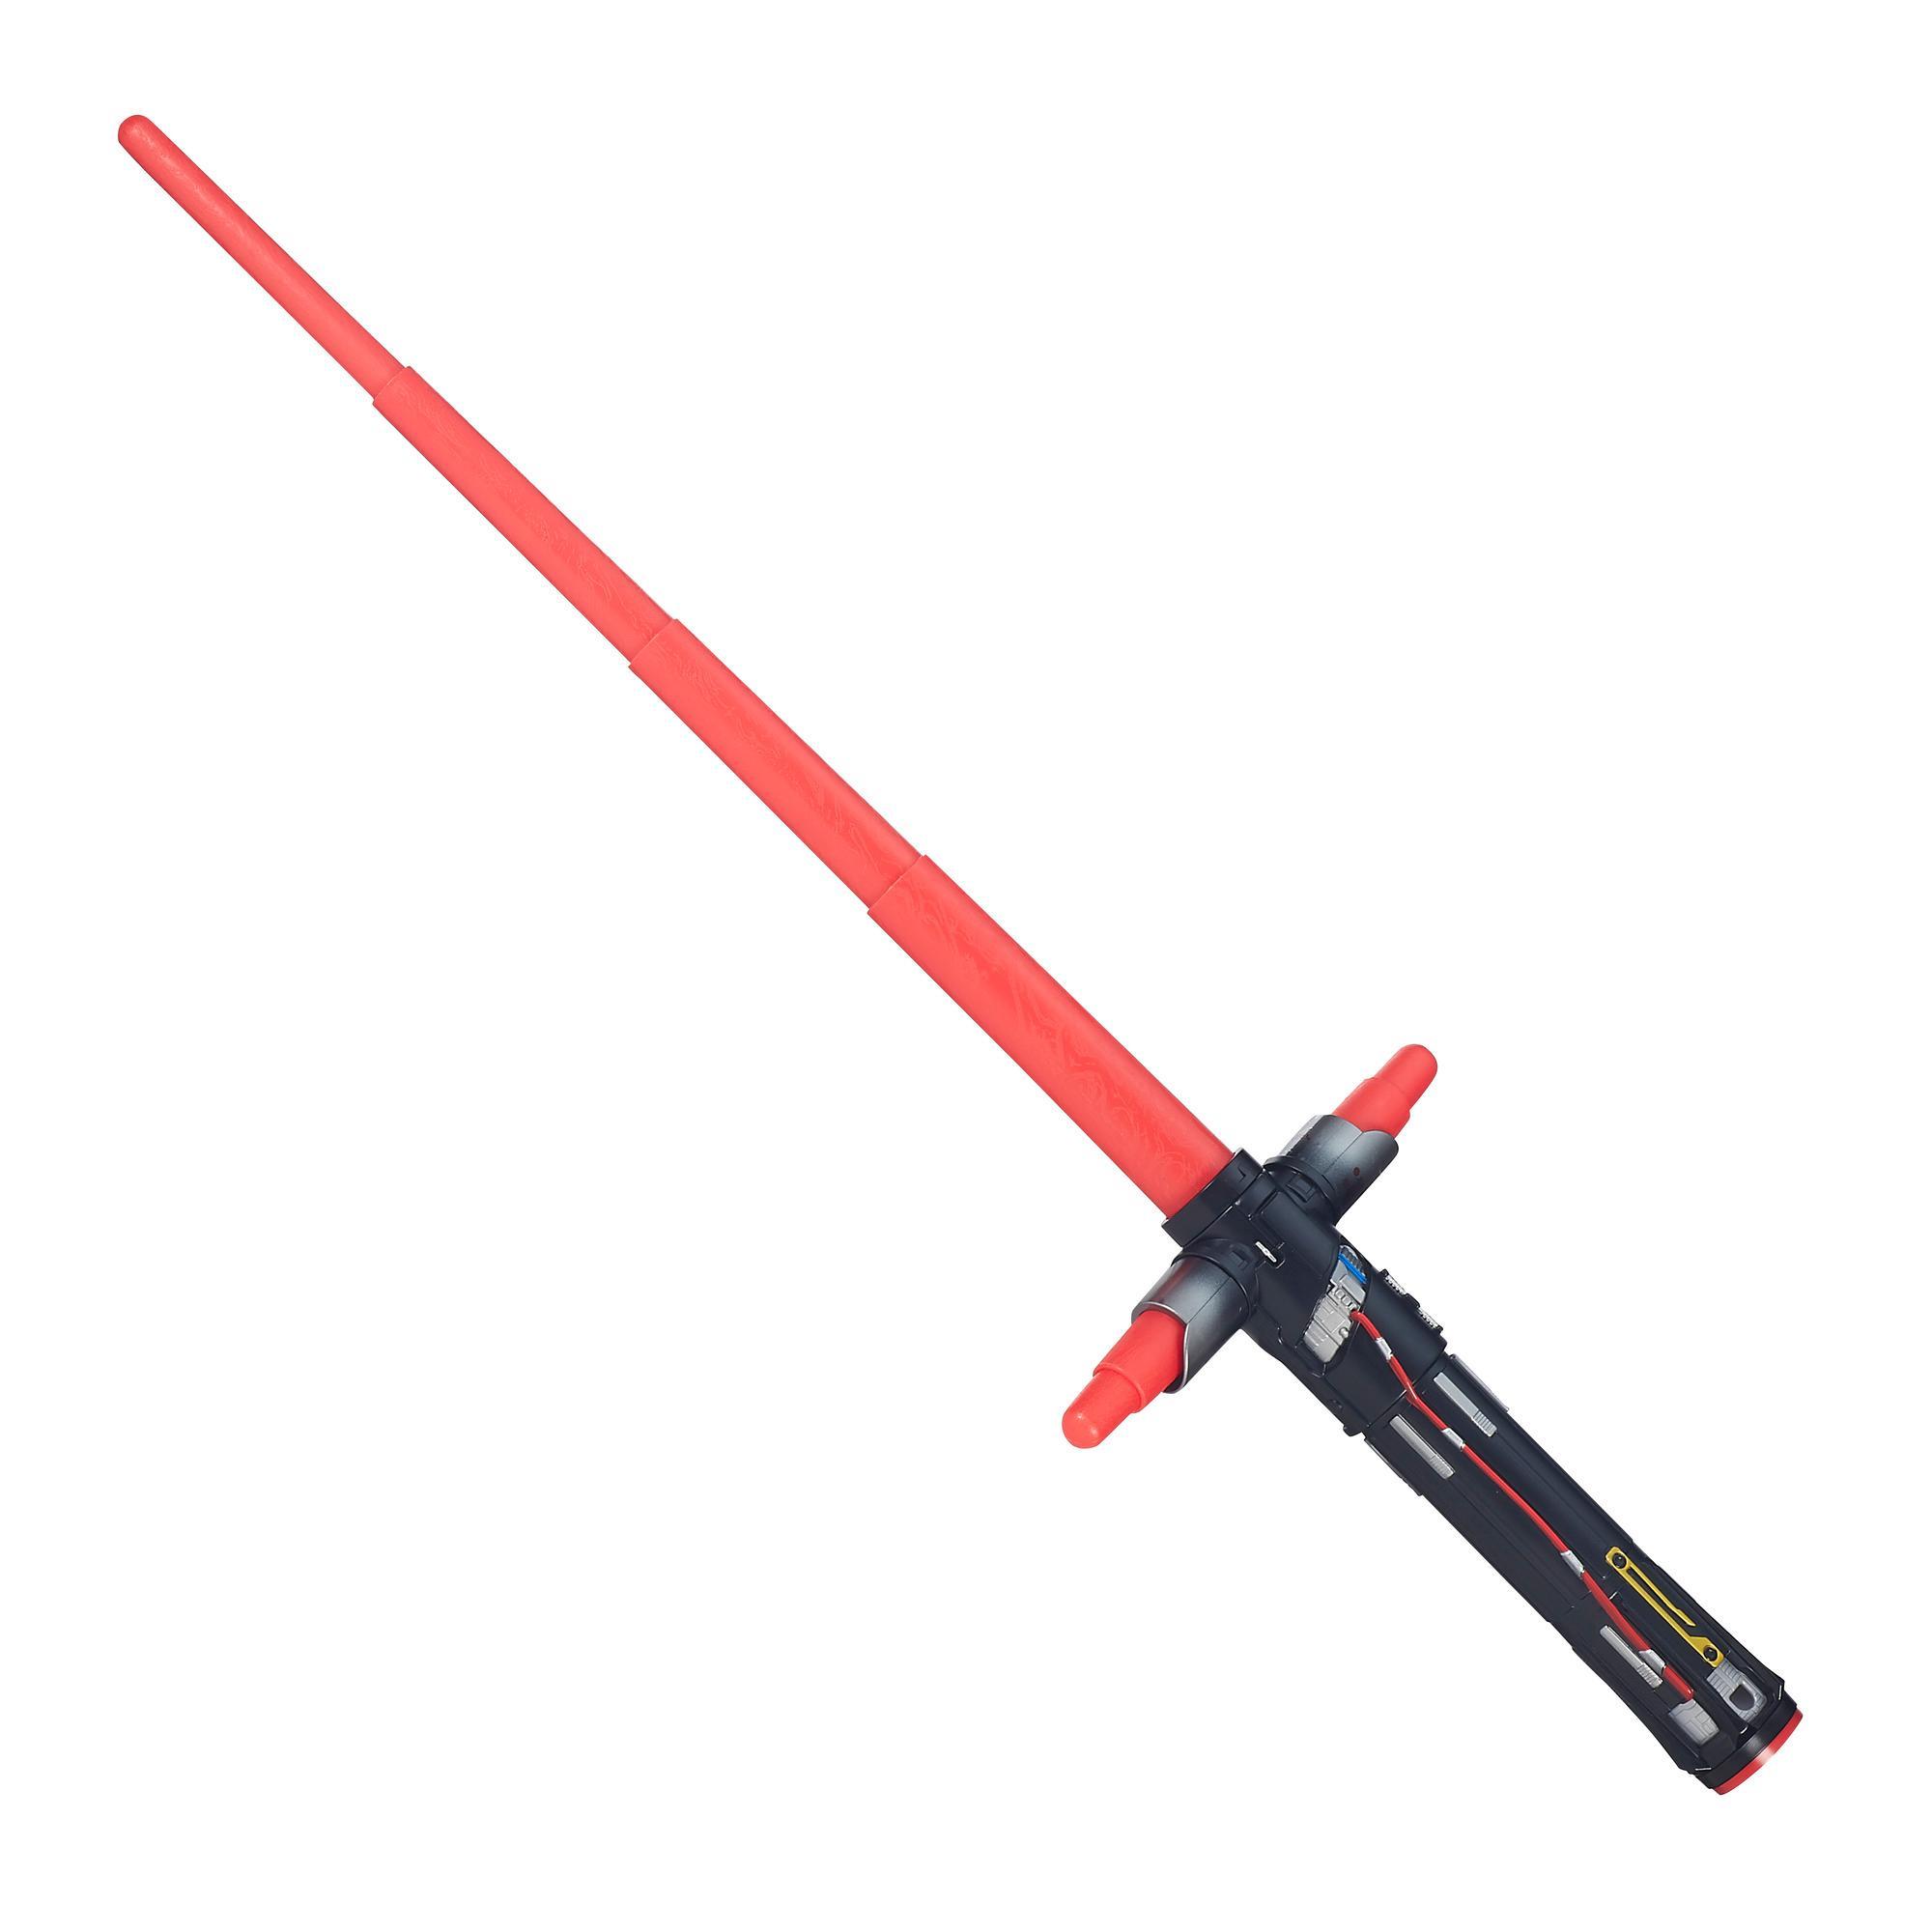 Star Wars The Force Awakens Kylo Ren Extendable Lightsaber